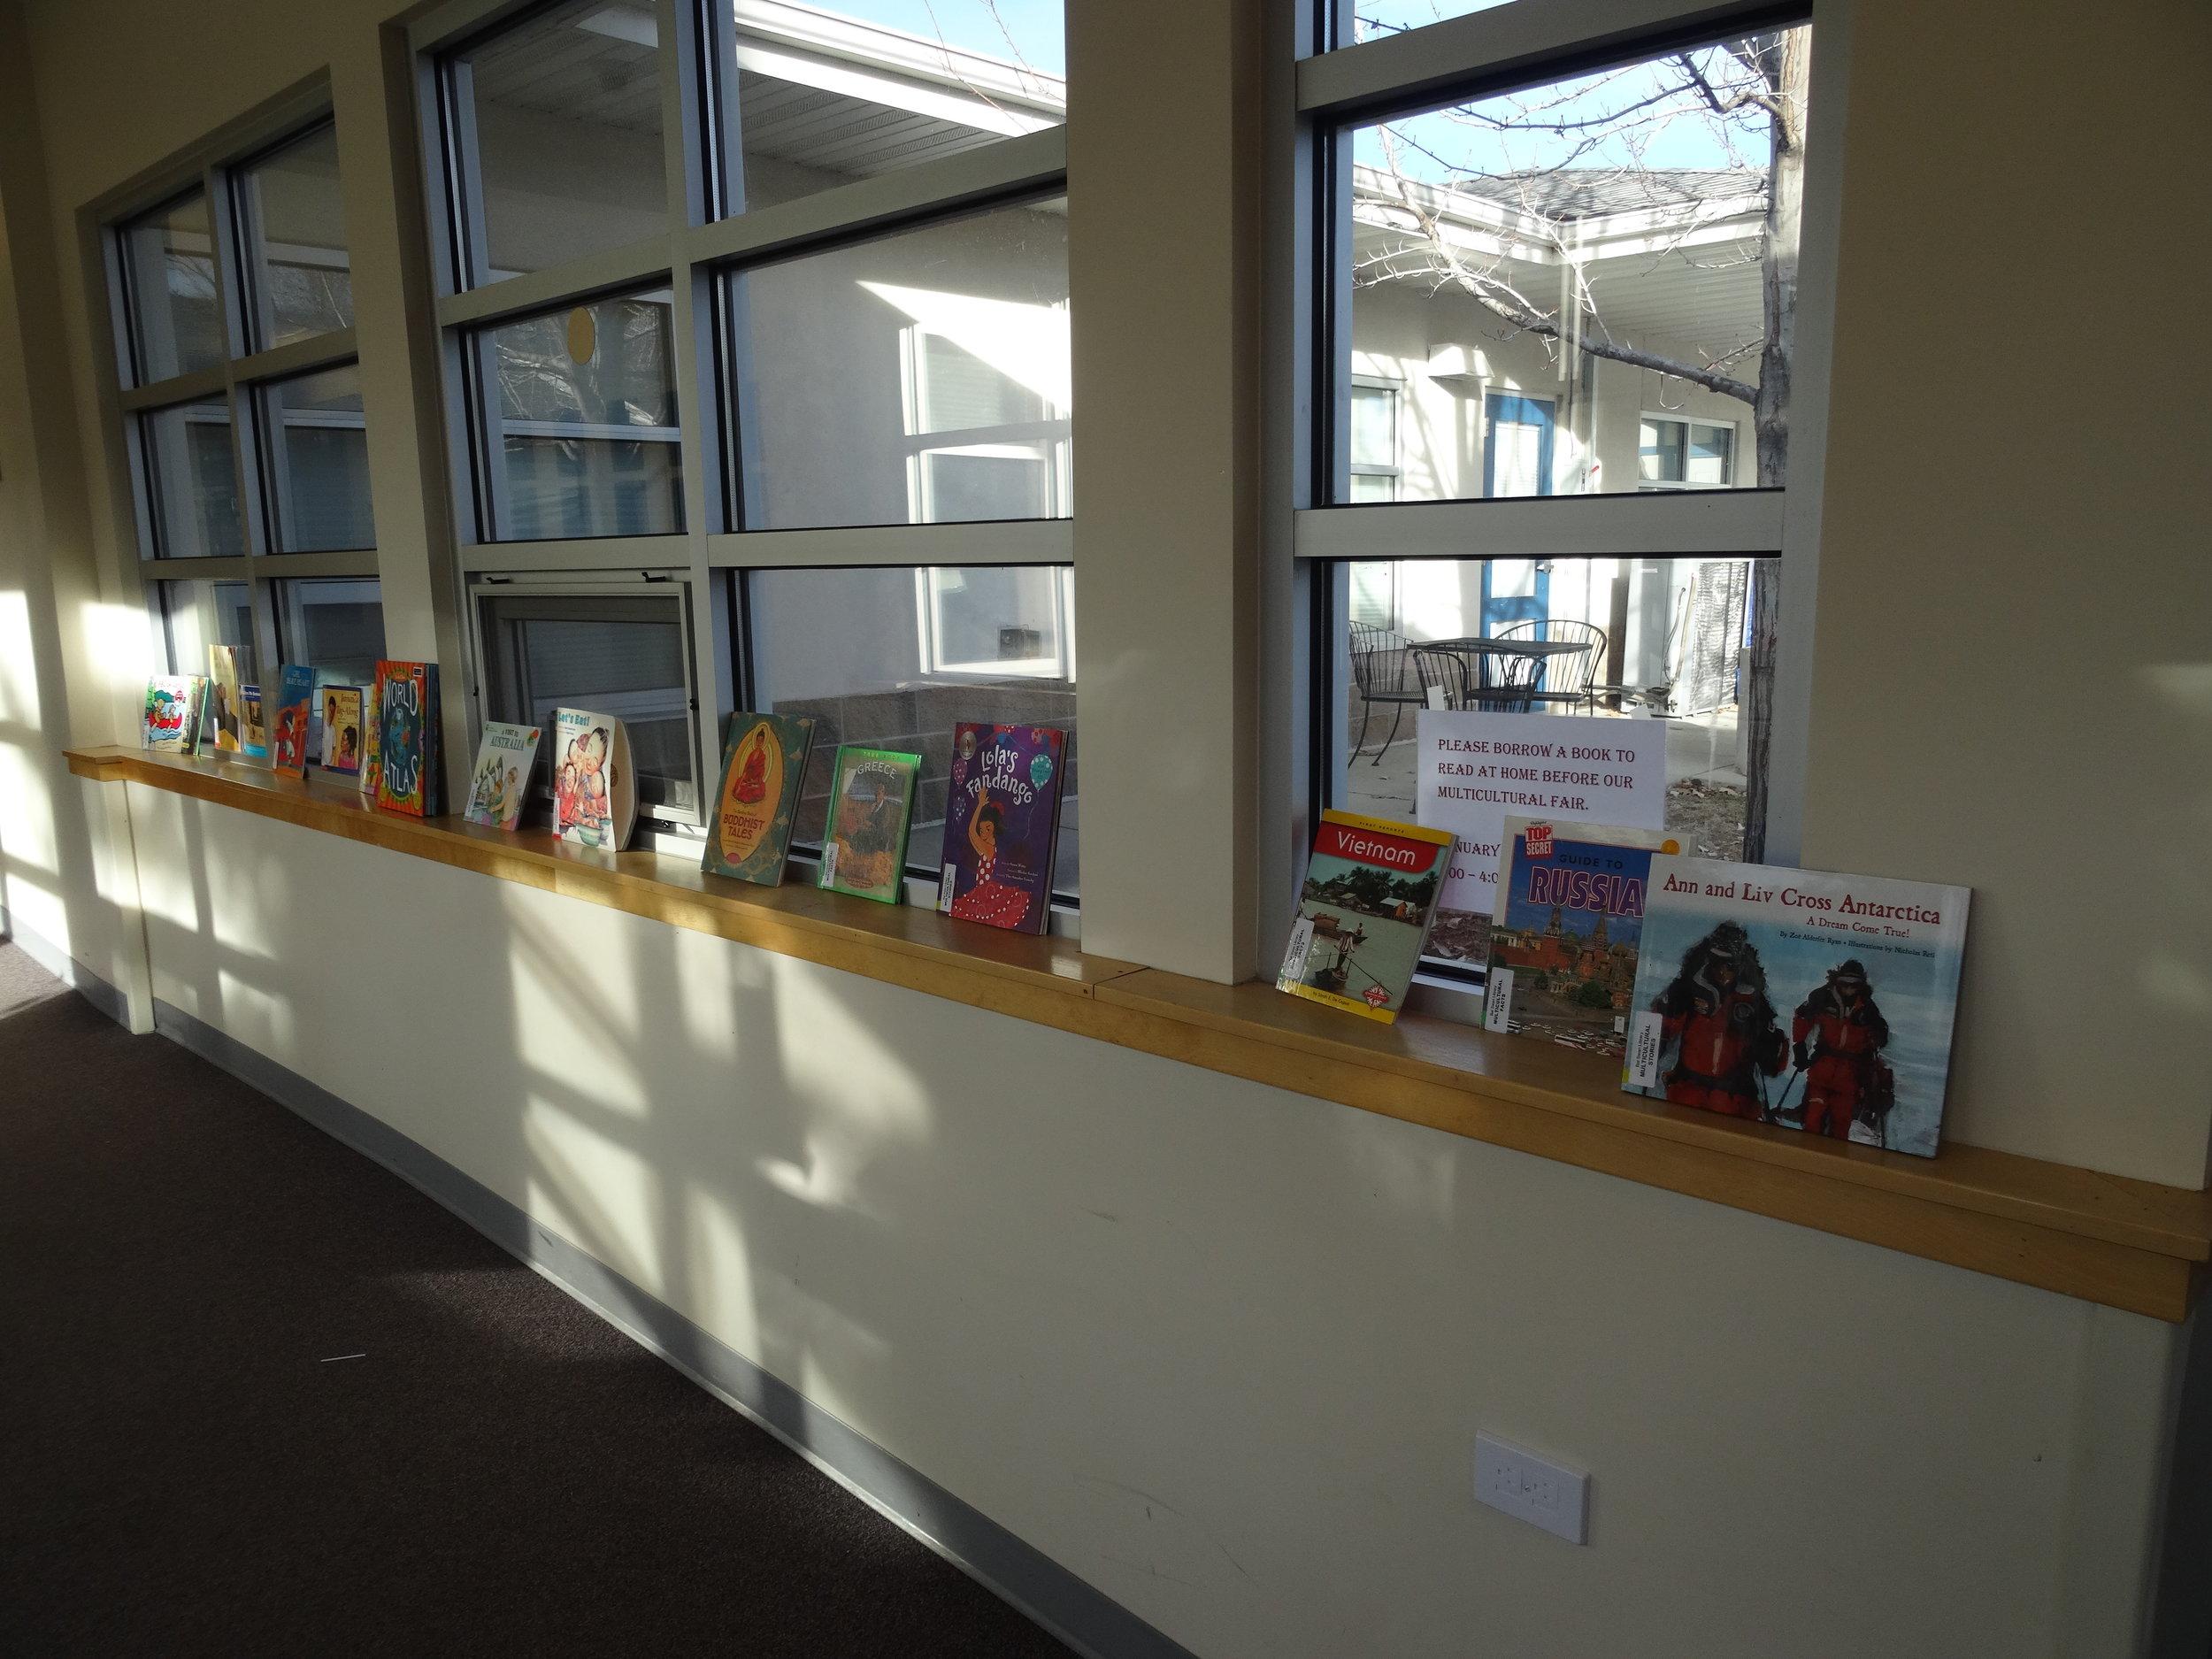 30_Back hallway display books 2.JPG